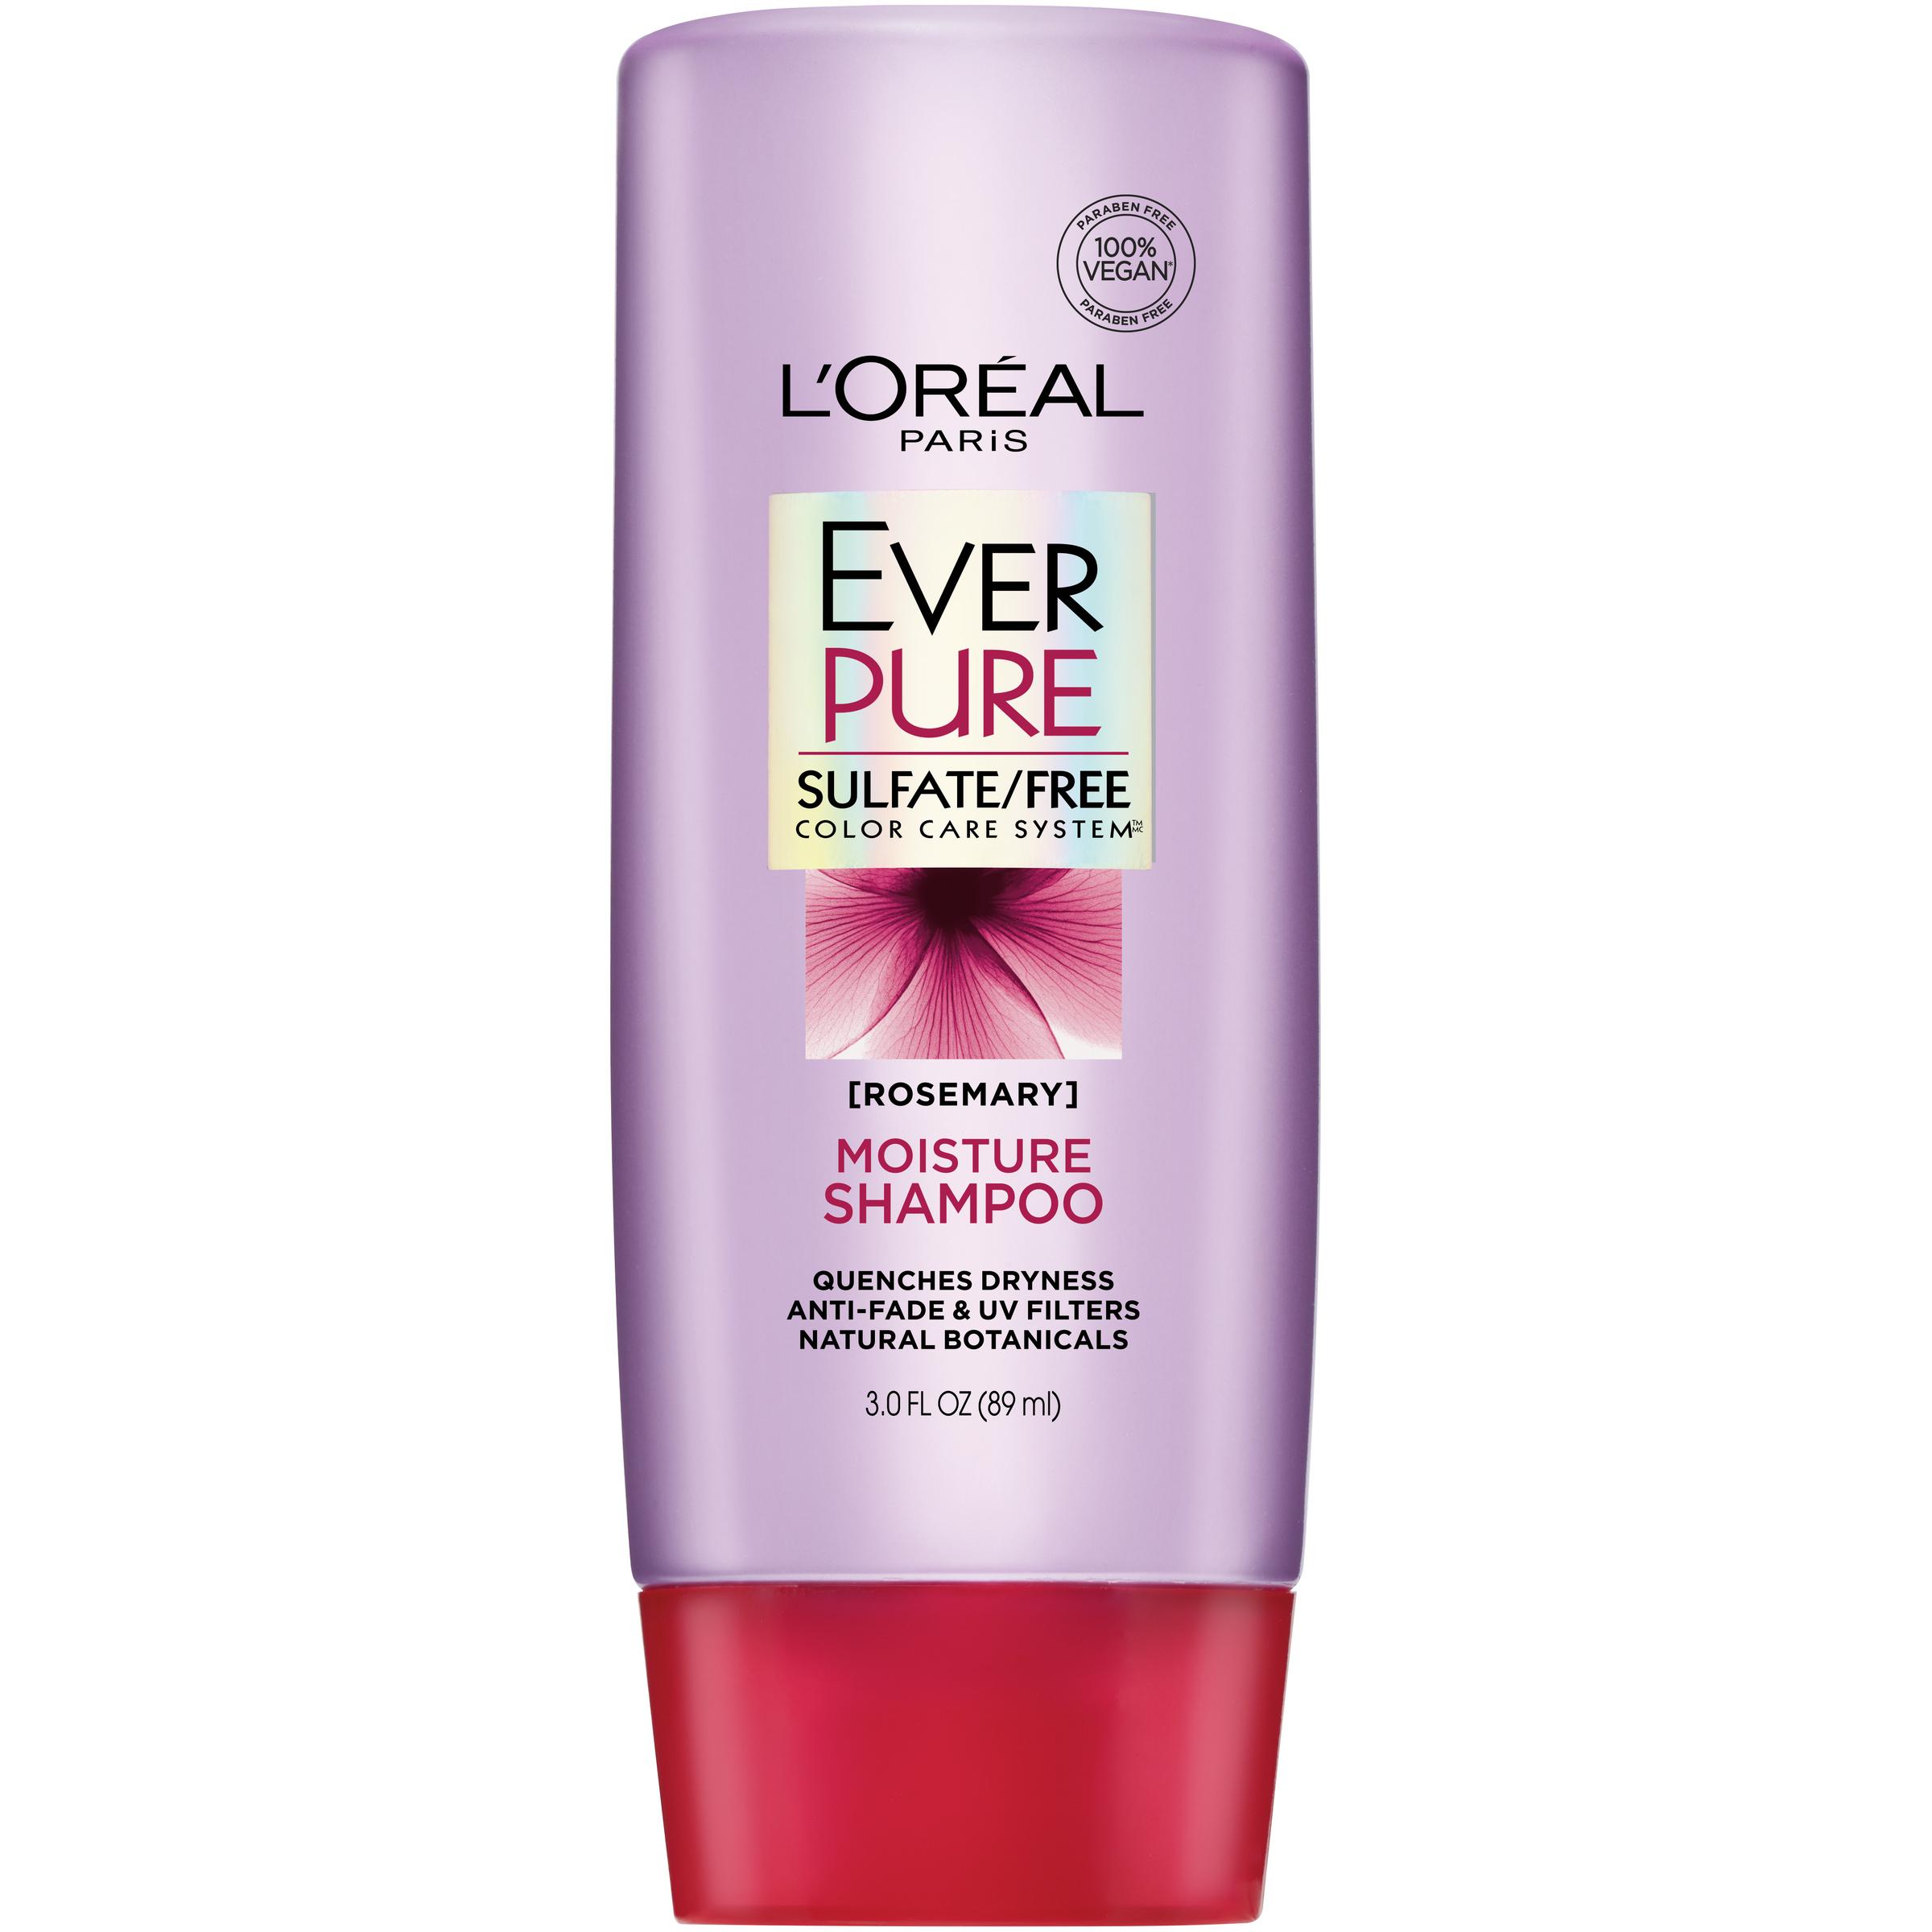 (2 Pack) L'Oreal Paris EverPure Sulfate Free Moisture Shampoo 3 FL OZ